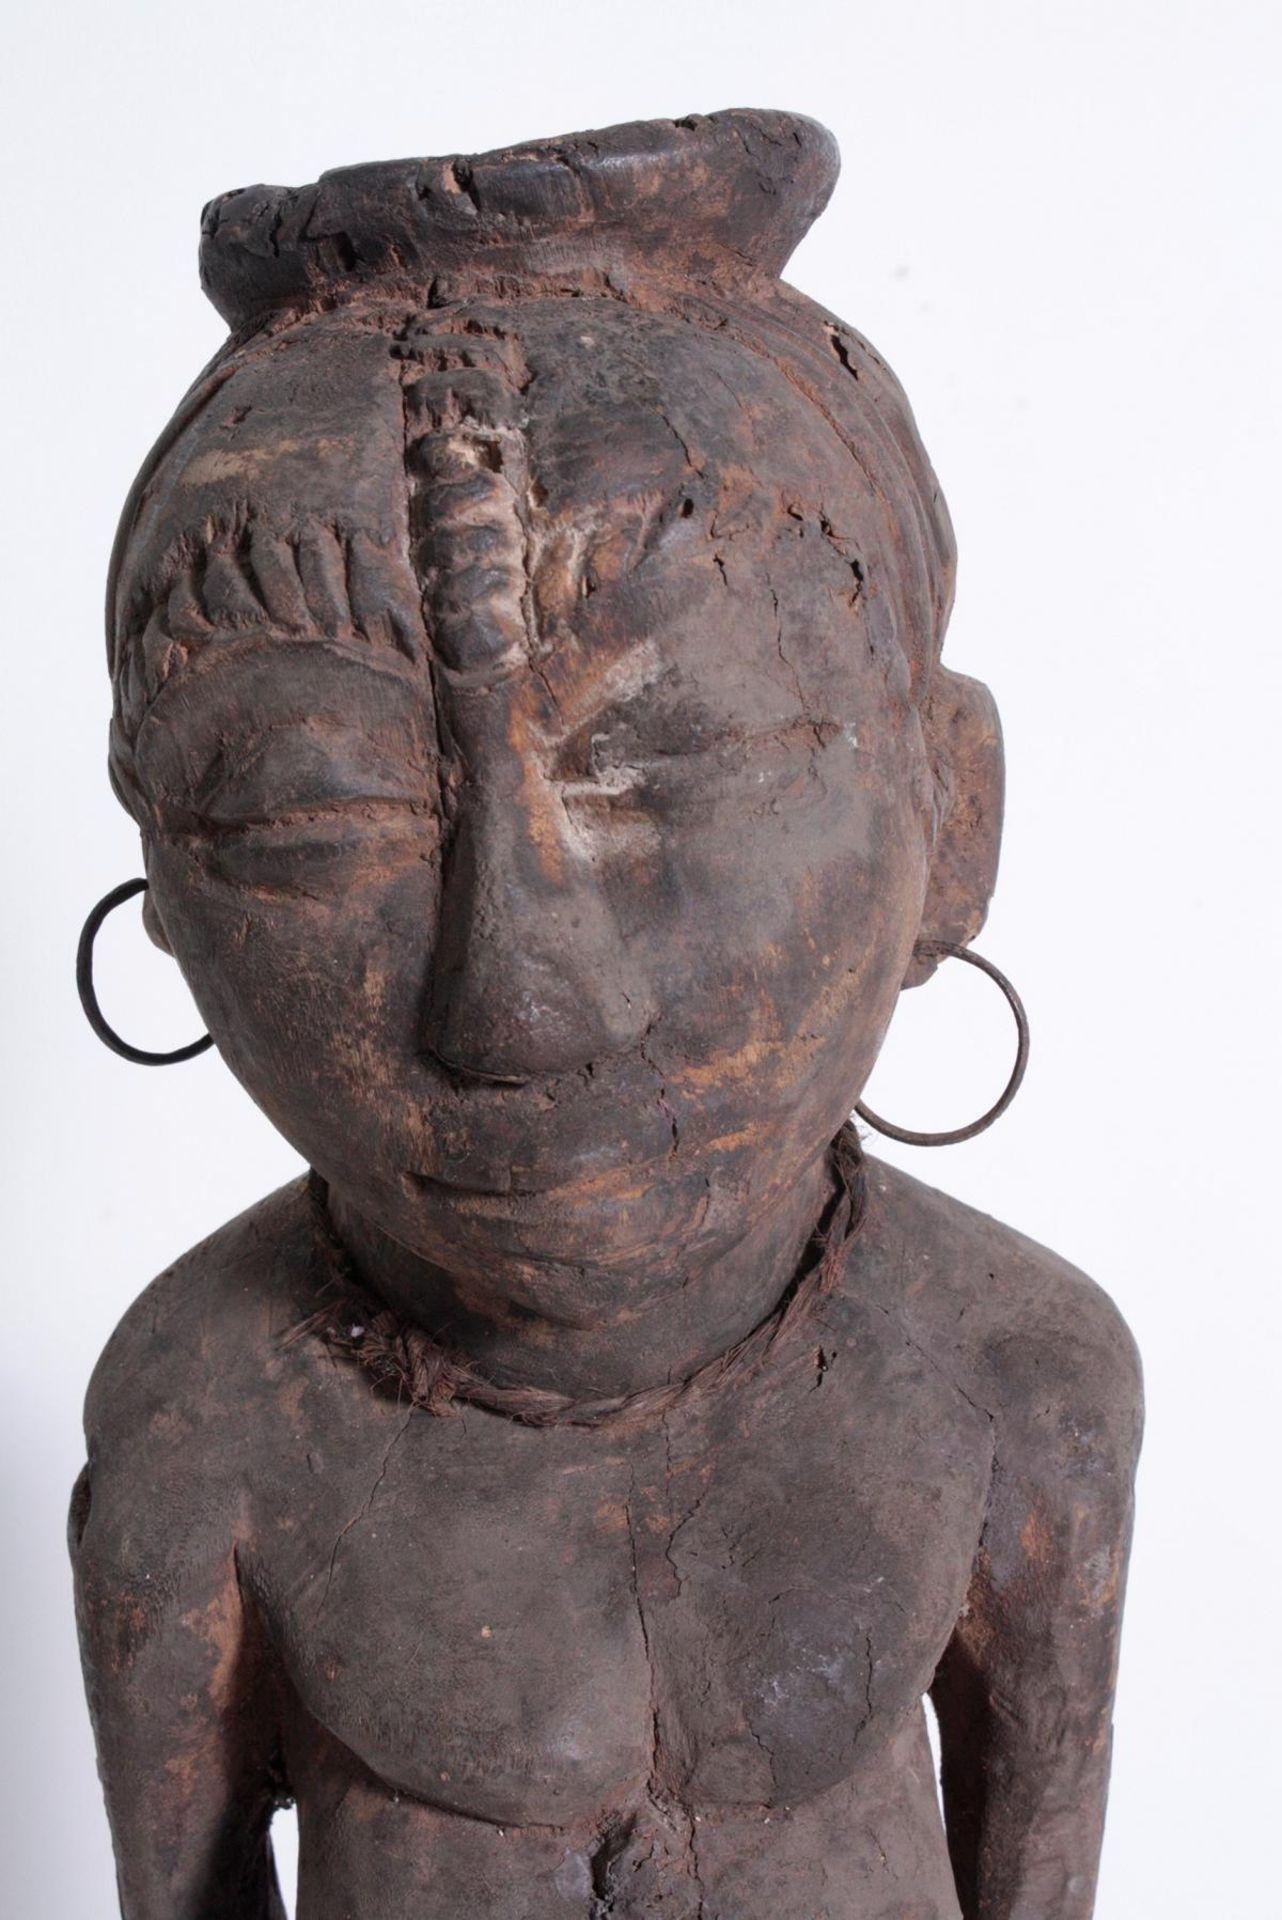 Ältere Ahnen-Figur, Tabwa, D. R. Kongo - Bild 2 aus 14